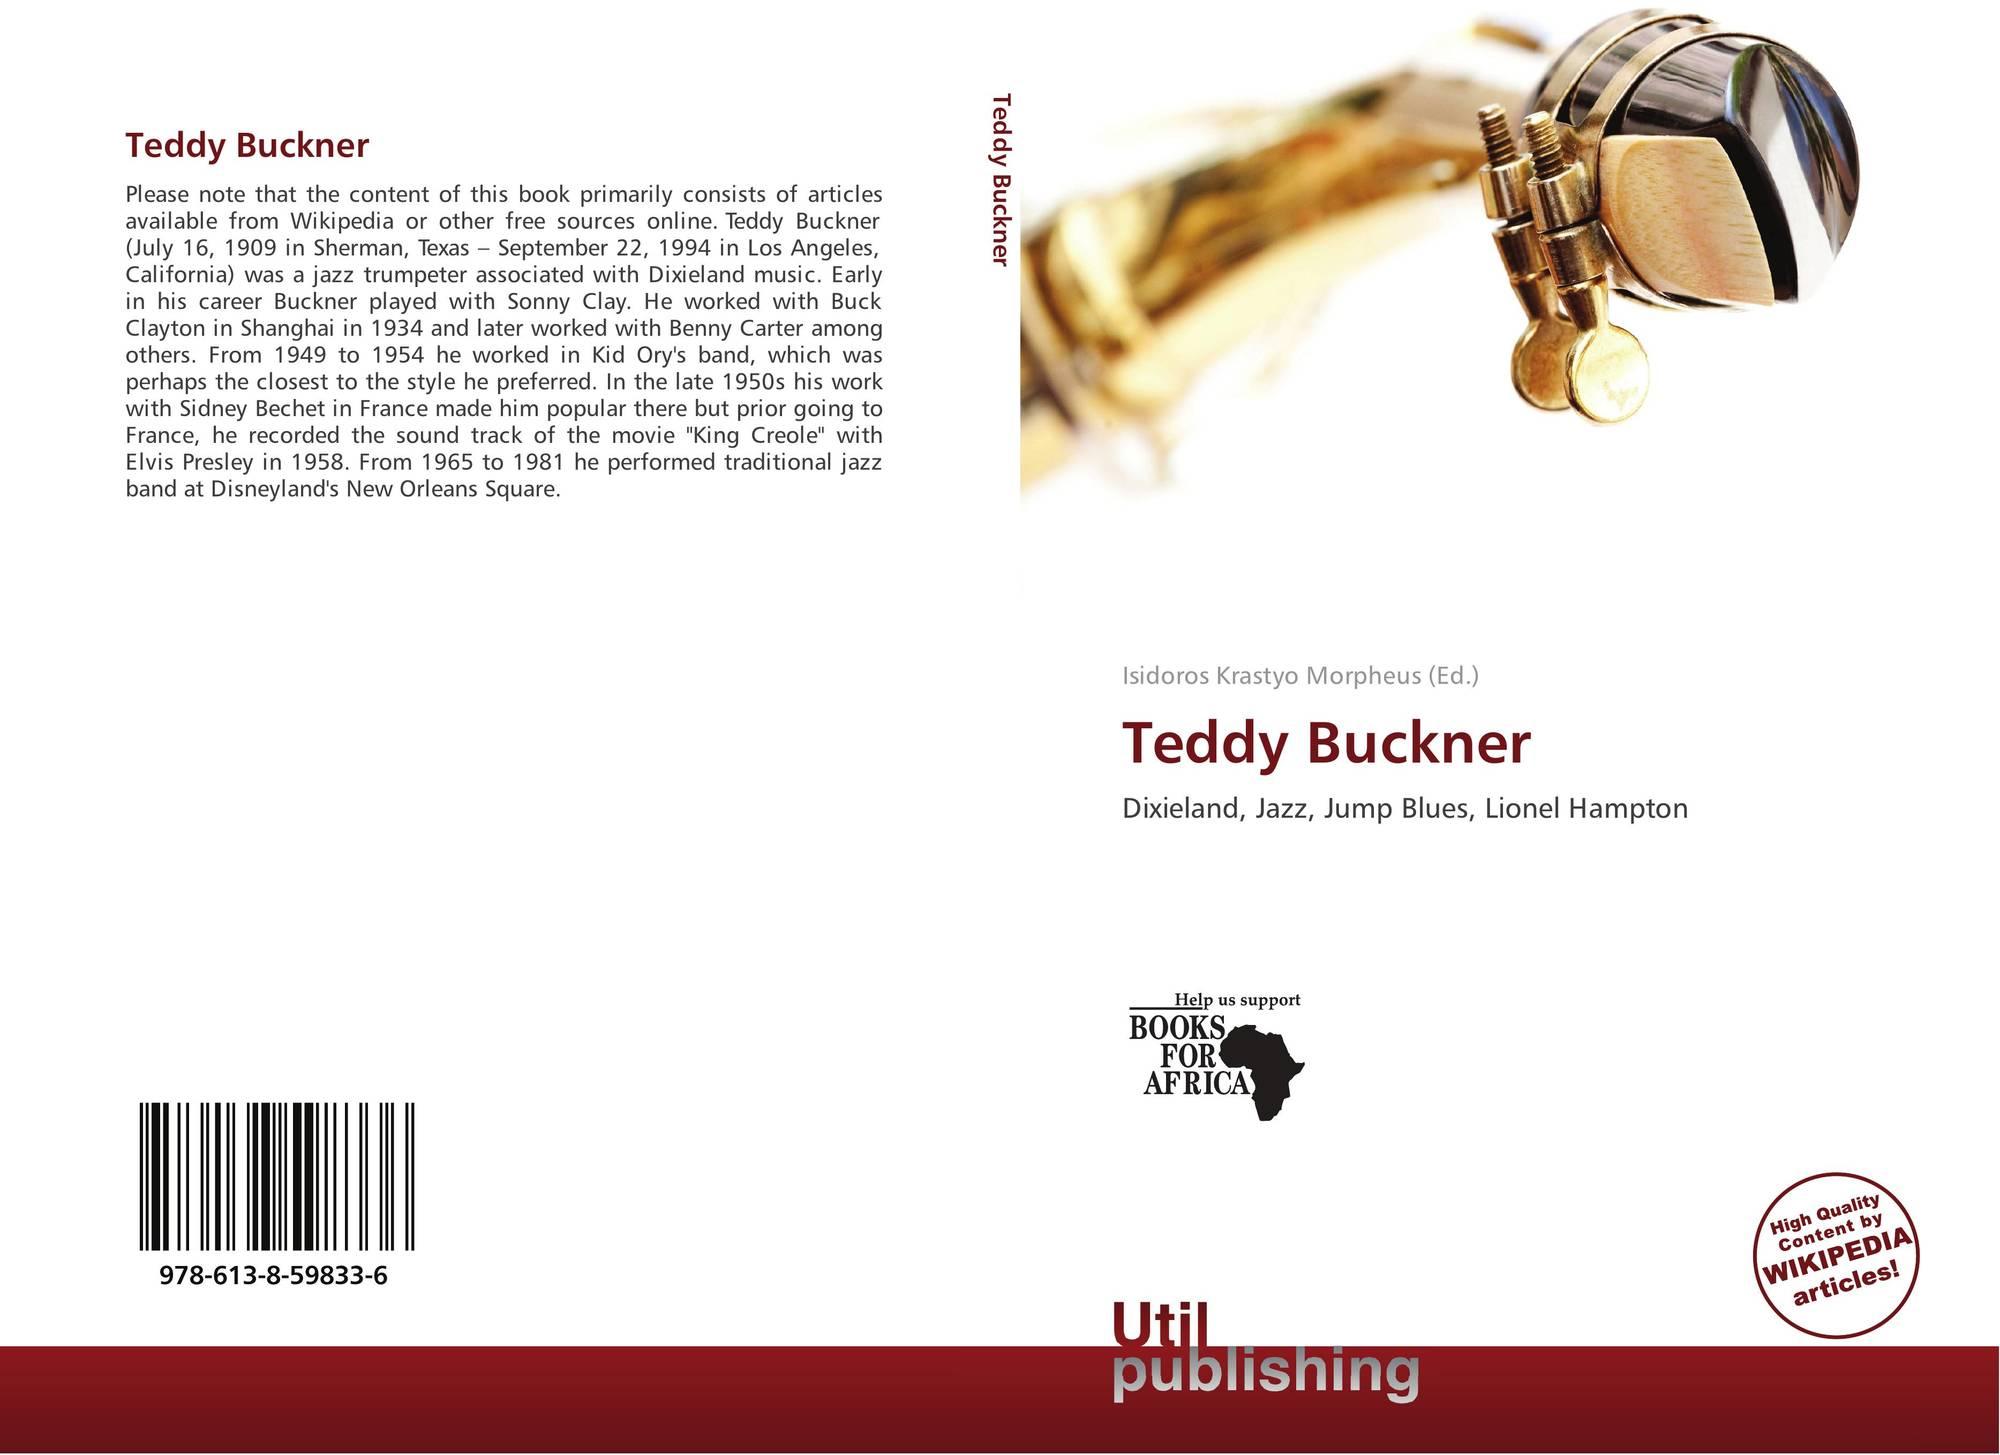 Amber Clayton Wikipedia teddy buckner, 978-613-8-59833-6, 6138598334 ,9786138598336